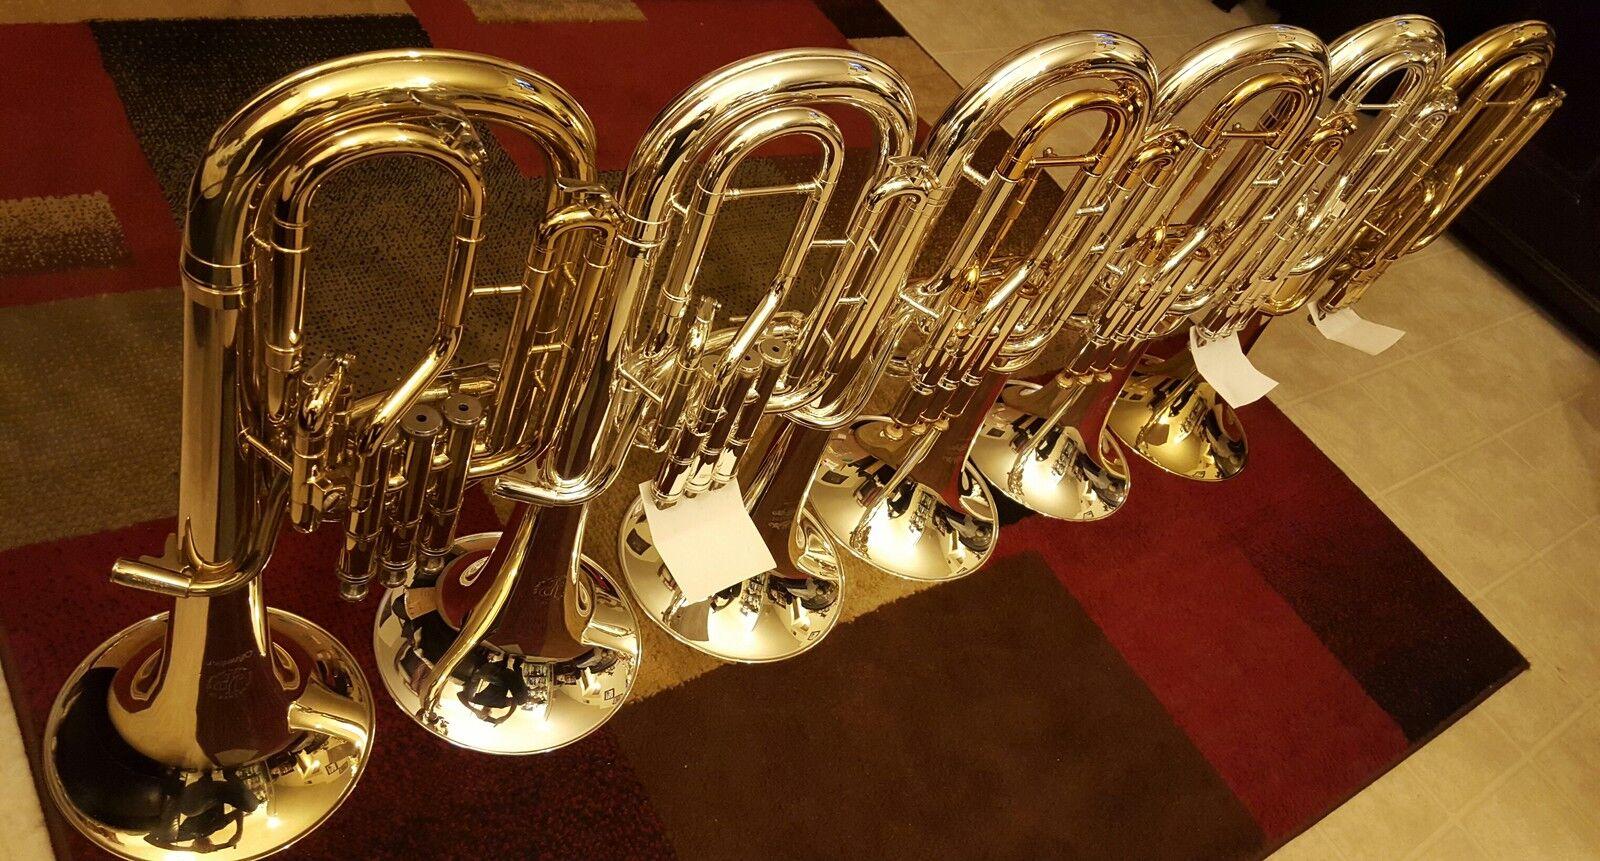 Puchon Musical Instruments